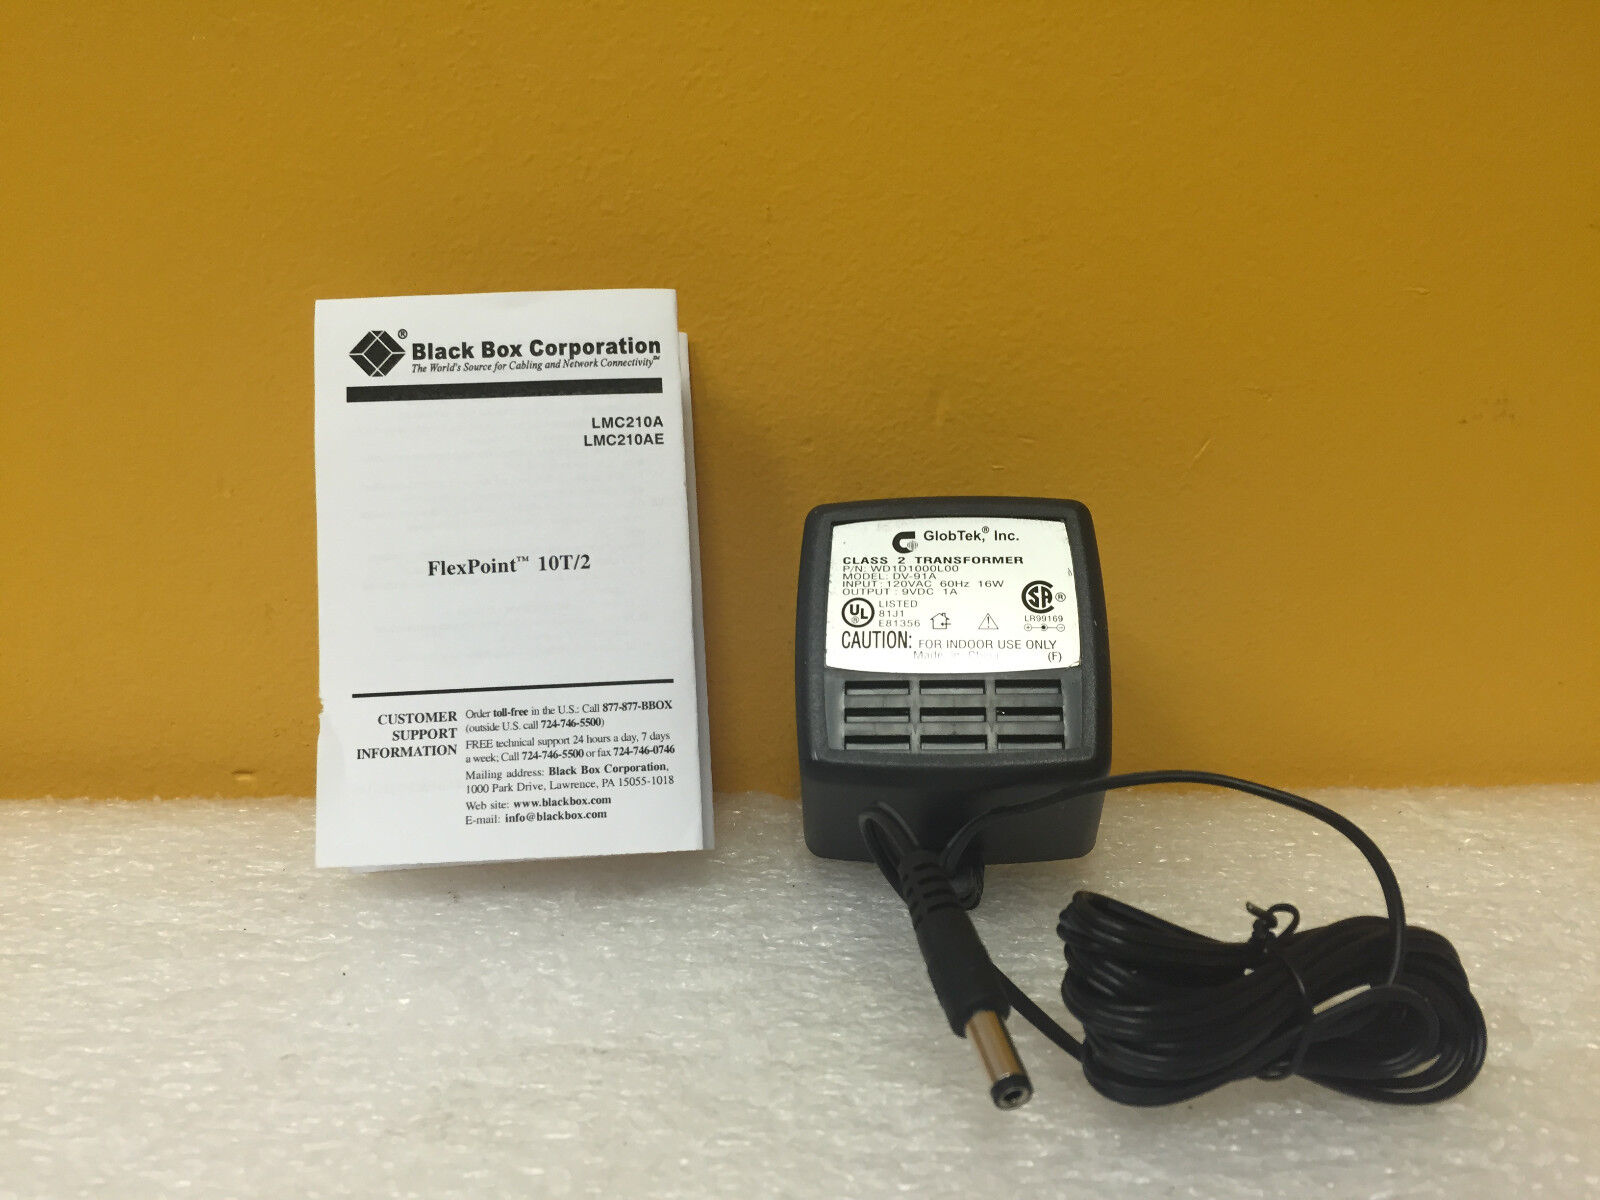 Black Box LMC203A, 120 VAC, 60 Hz, 16 W, 9V-1A, AC Adapter / Transformer, New!